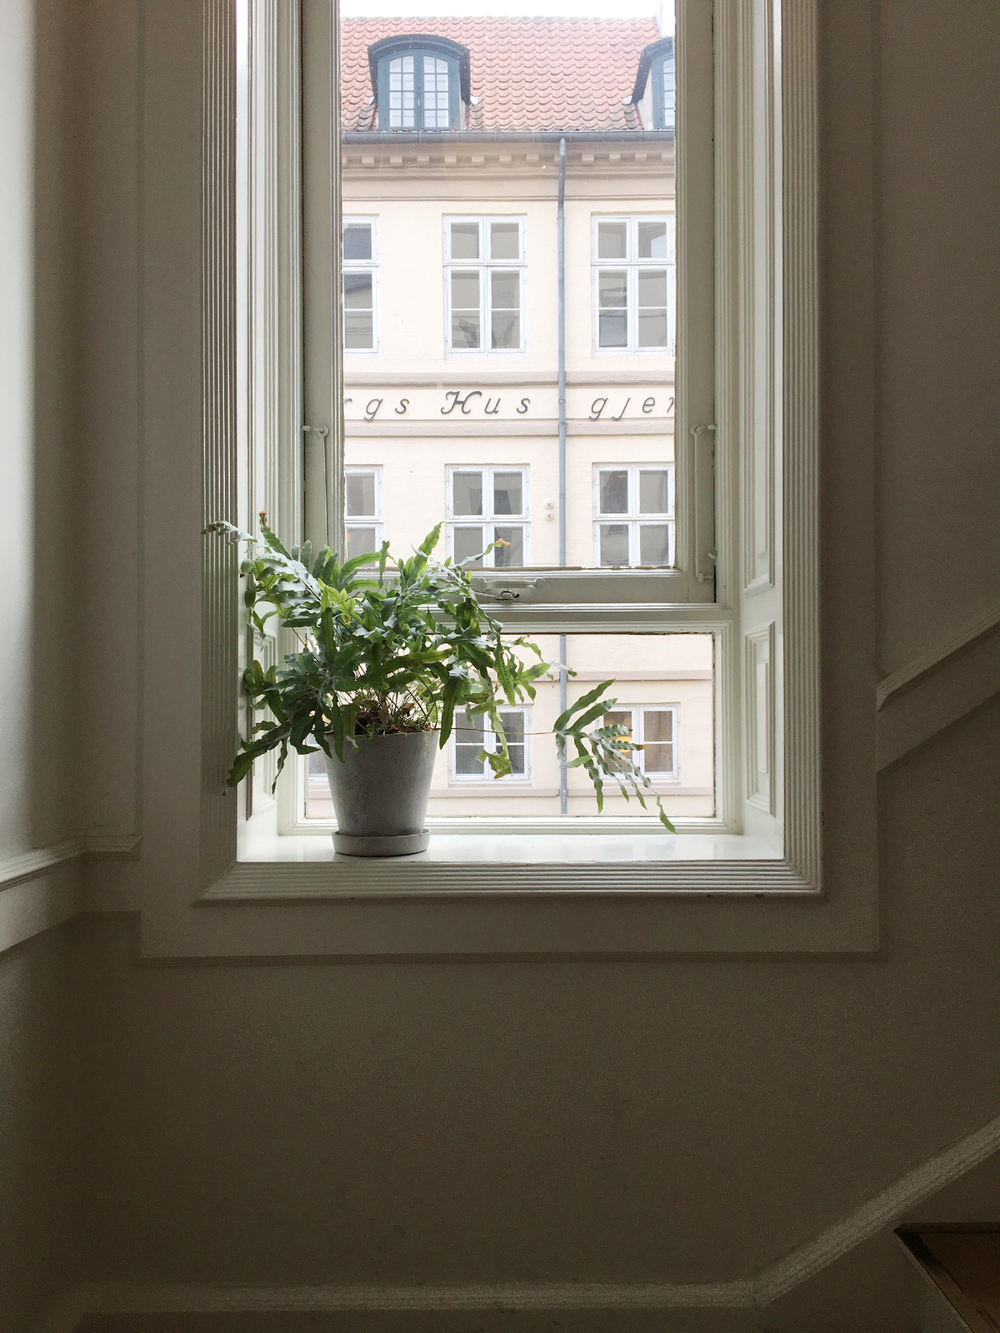 The architecture and design in Copenhagen is singular.